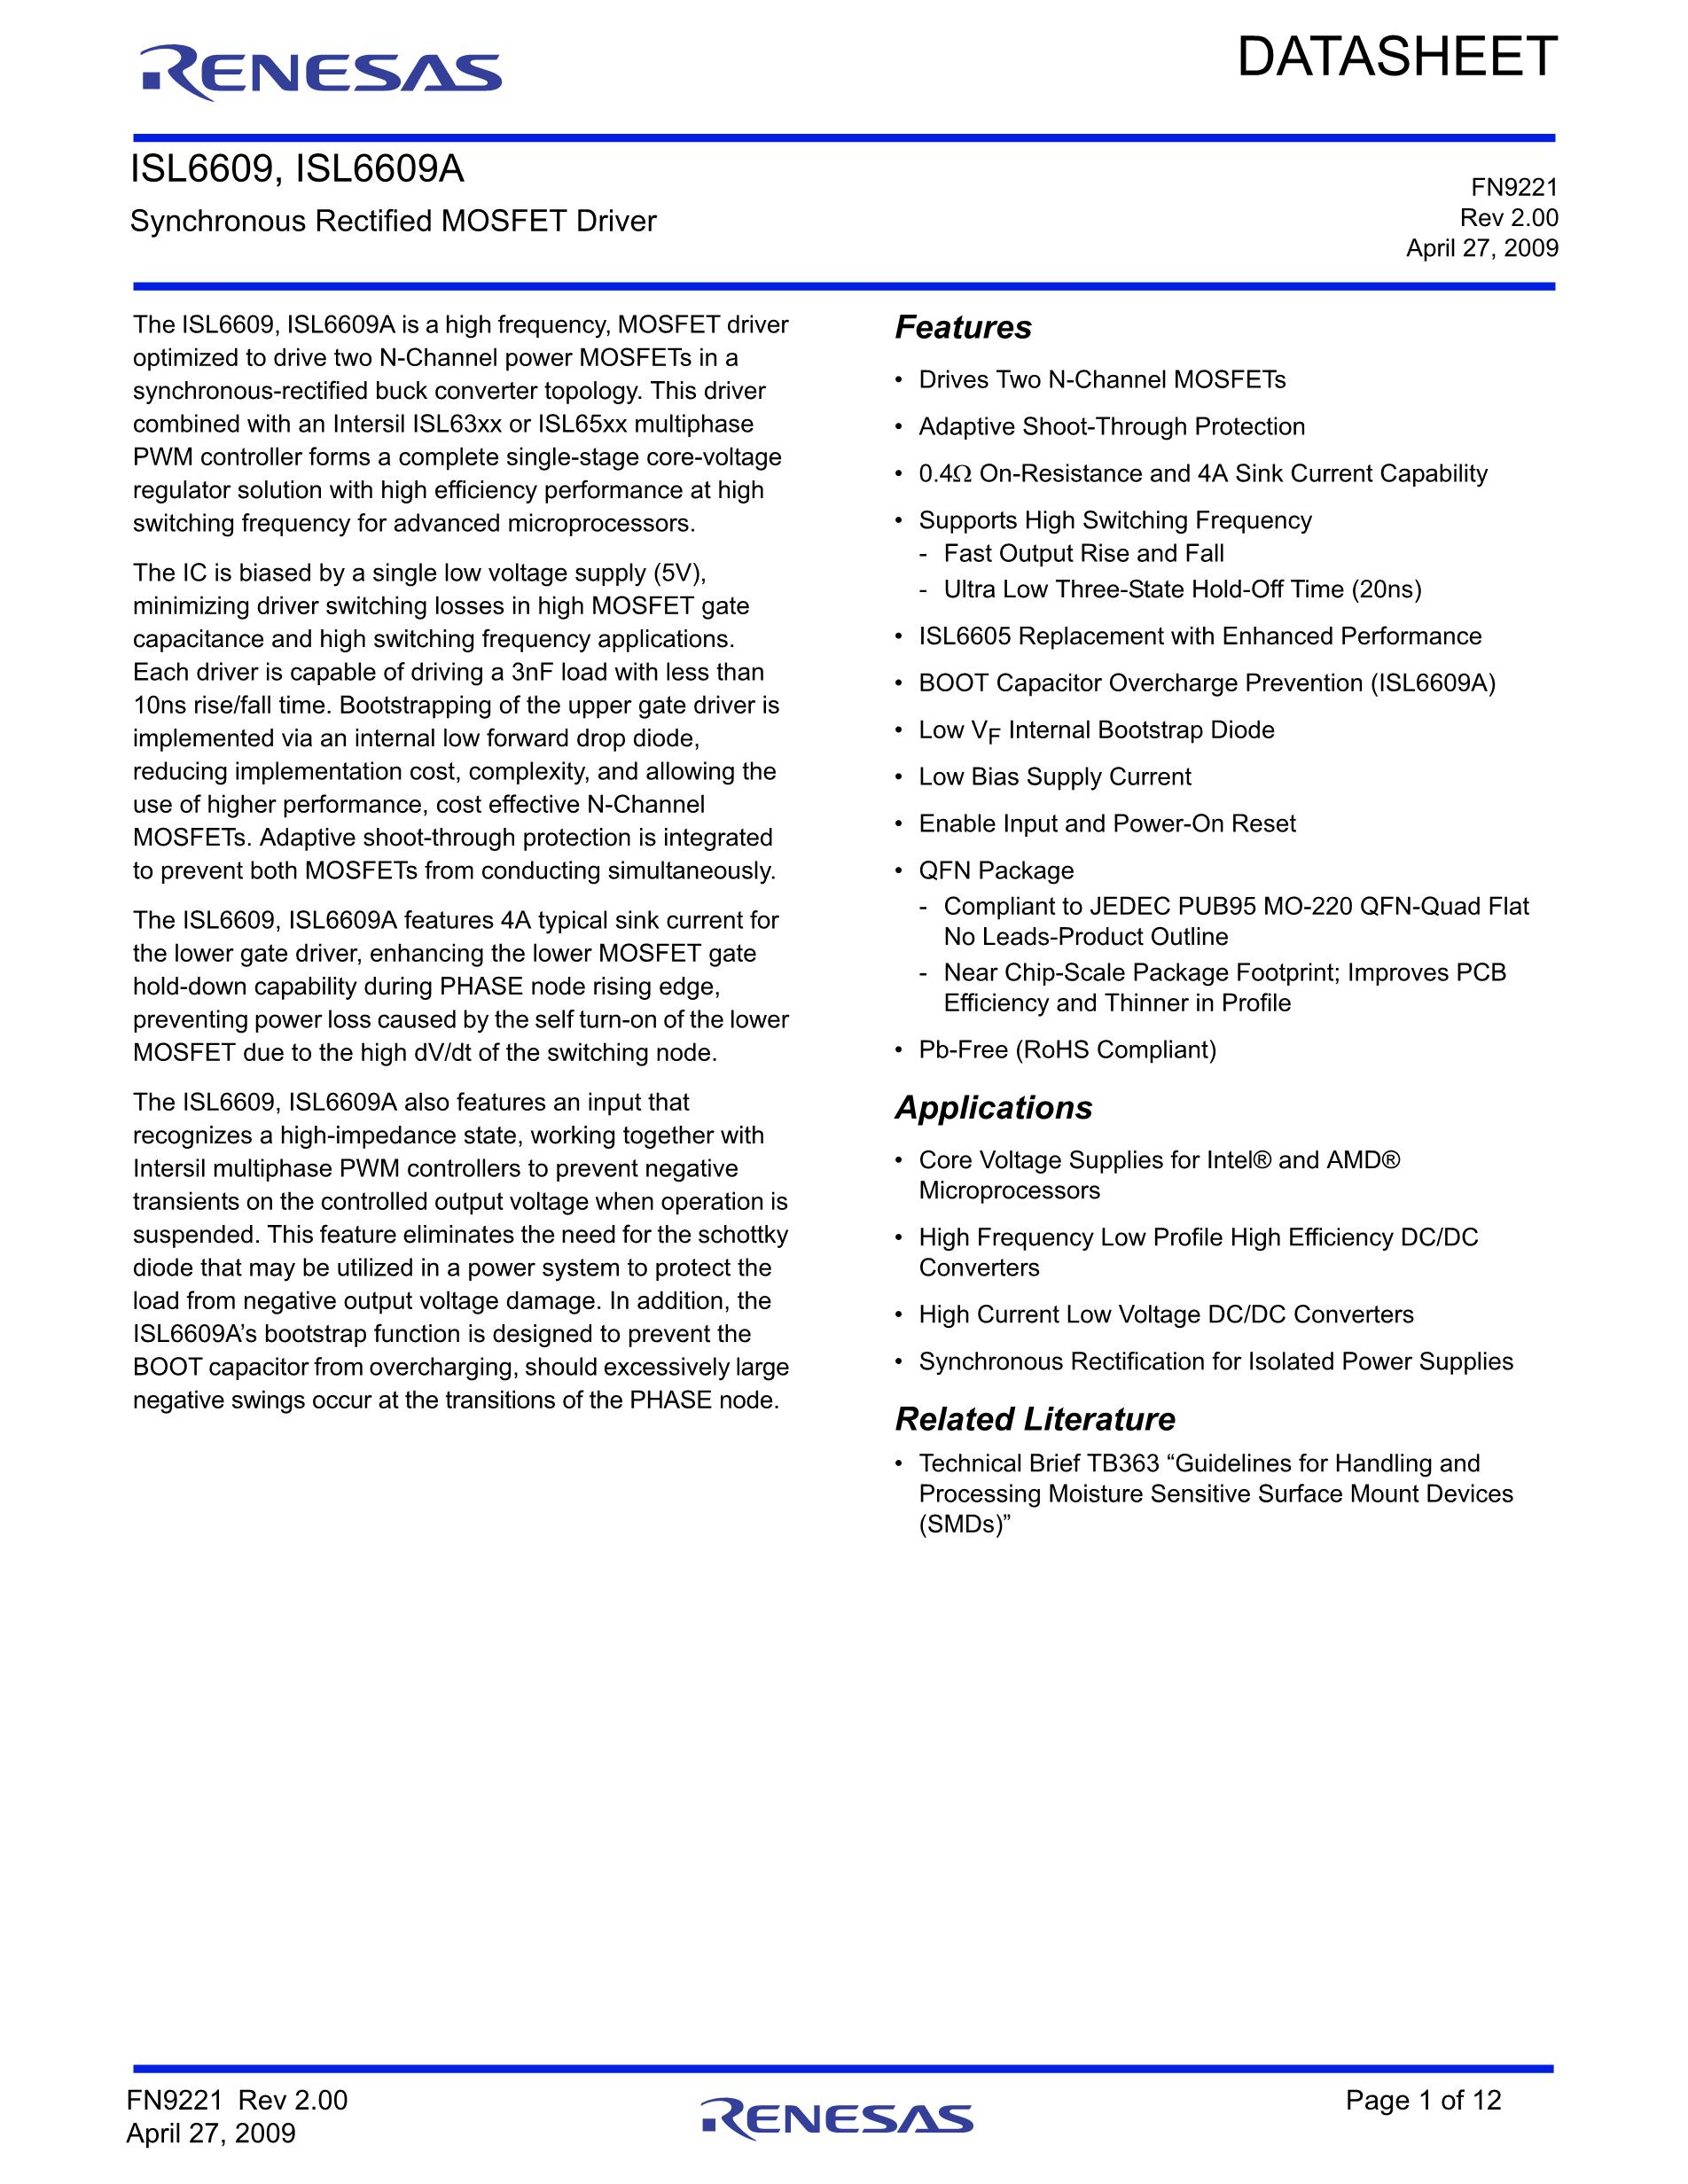 ISL6146DFUZ-T's pdf picture 1